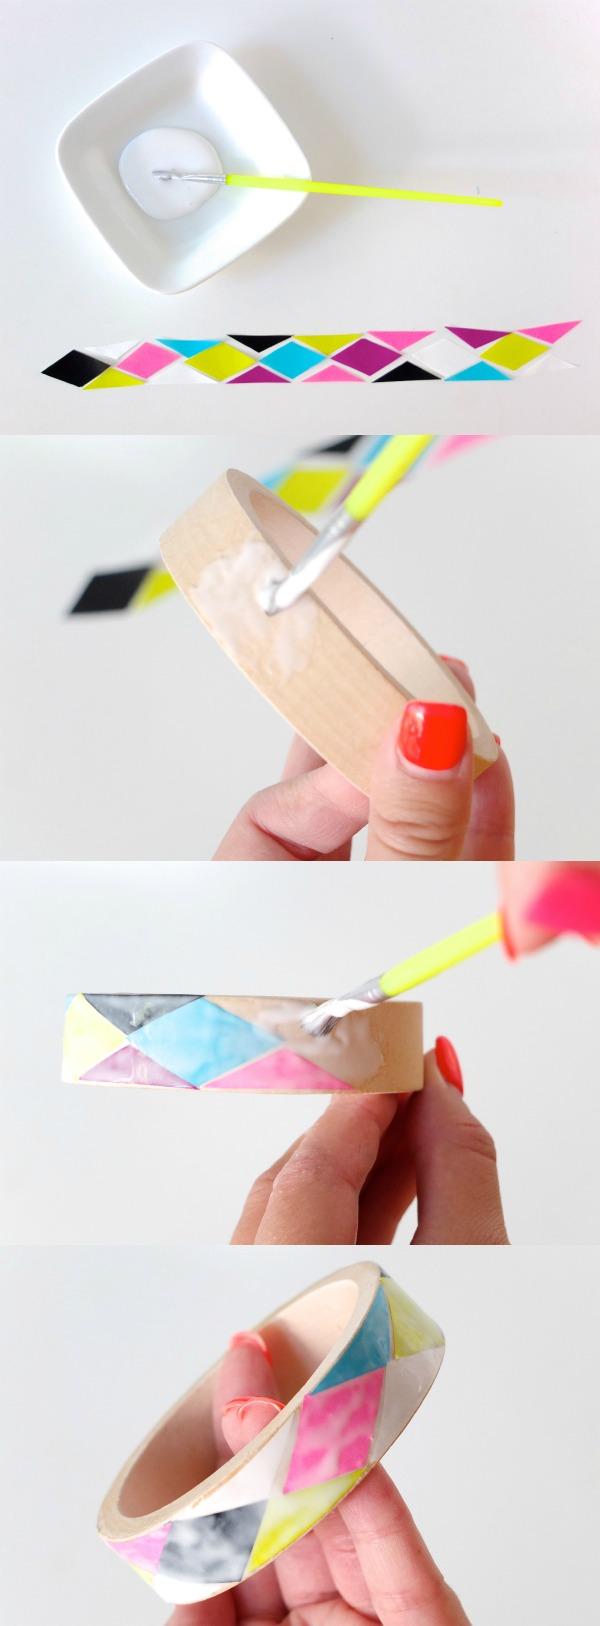 Bangle DIY tutorial steps